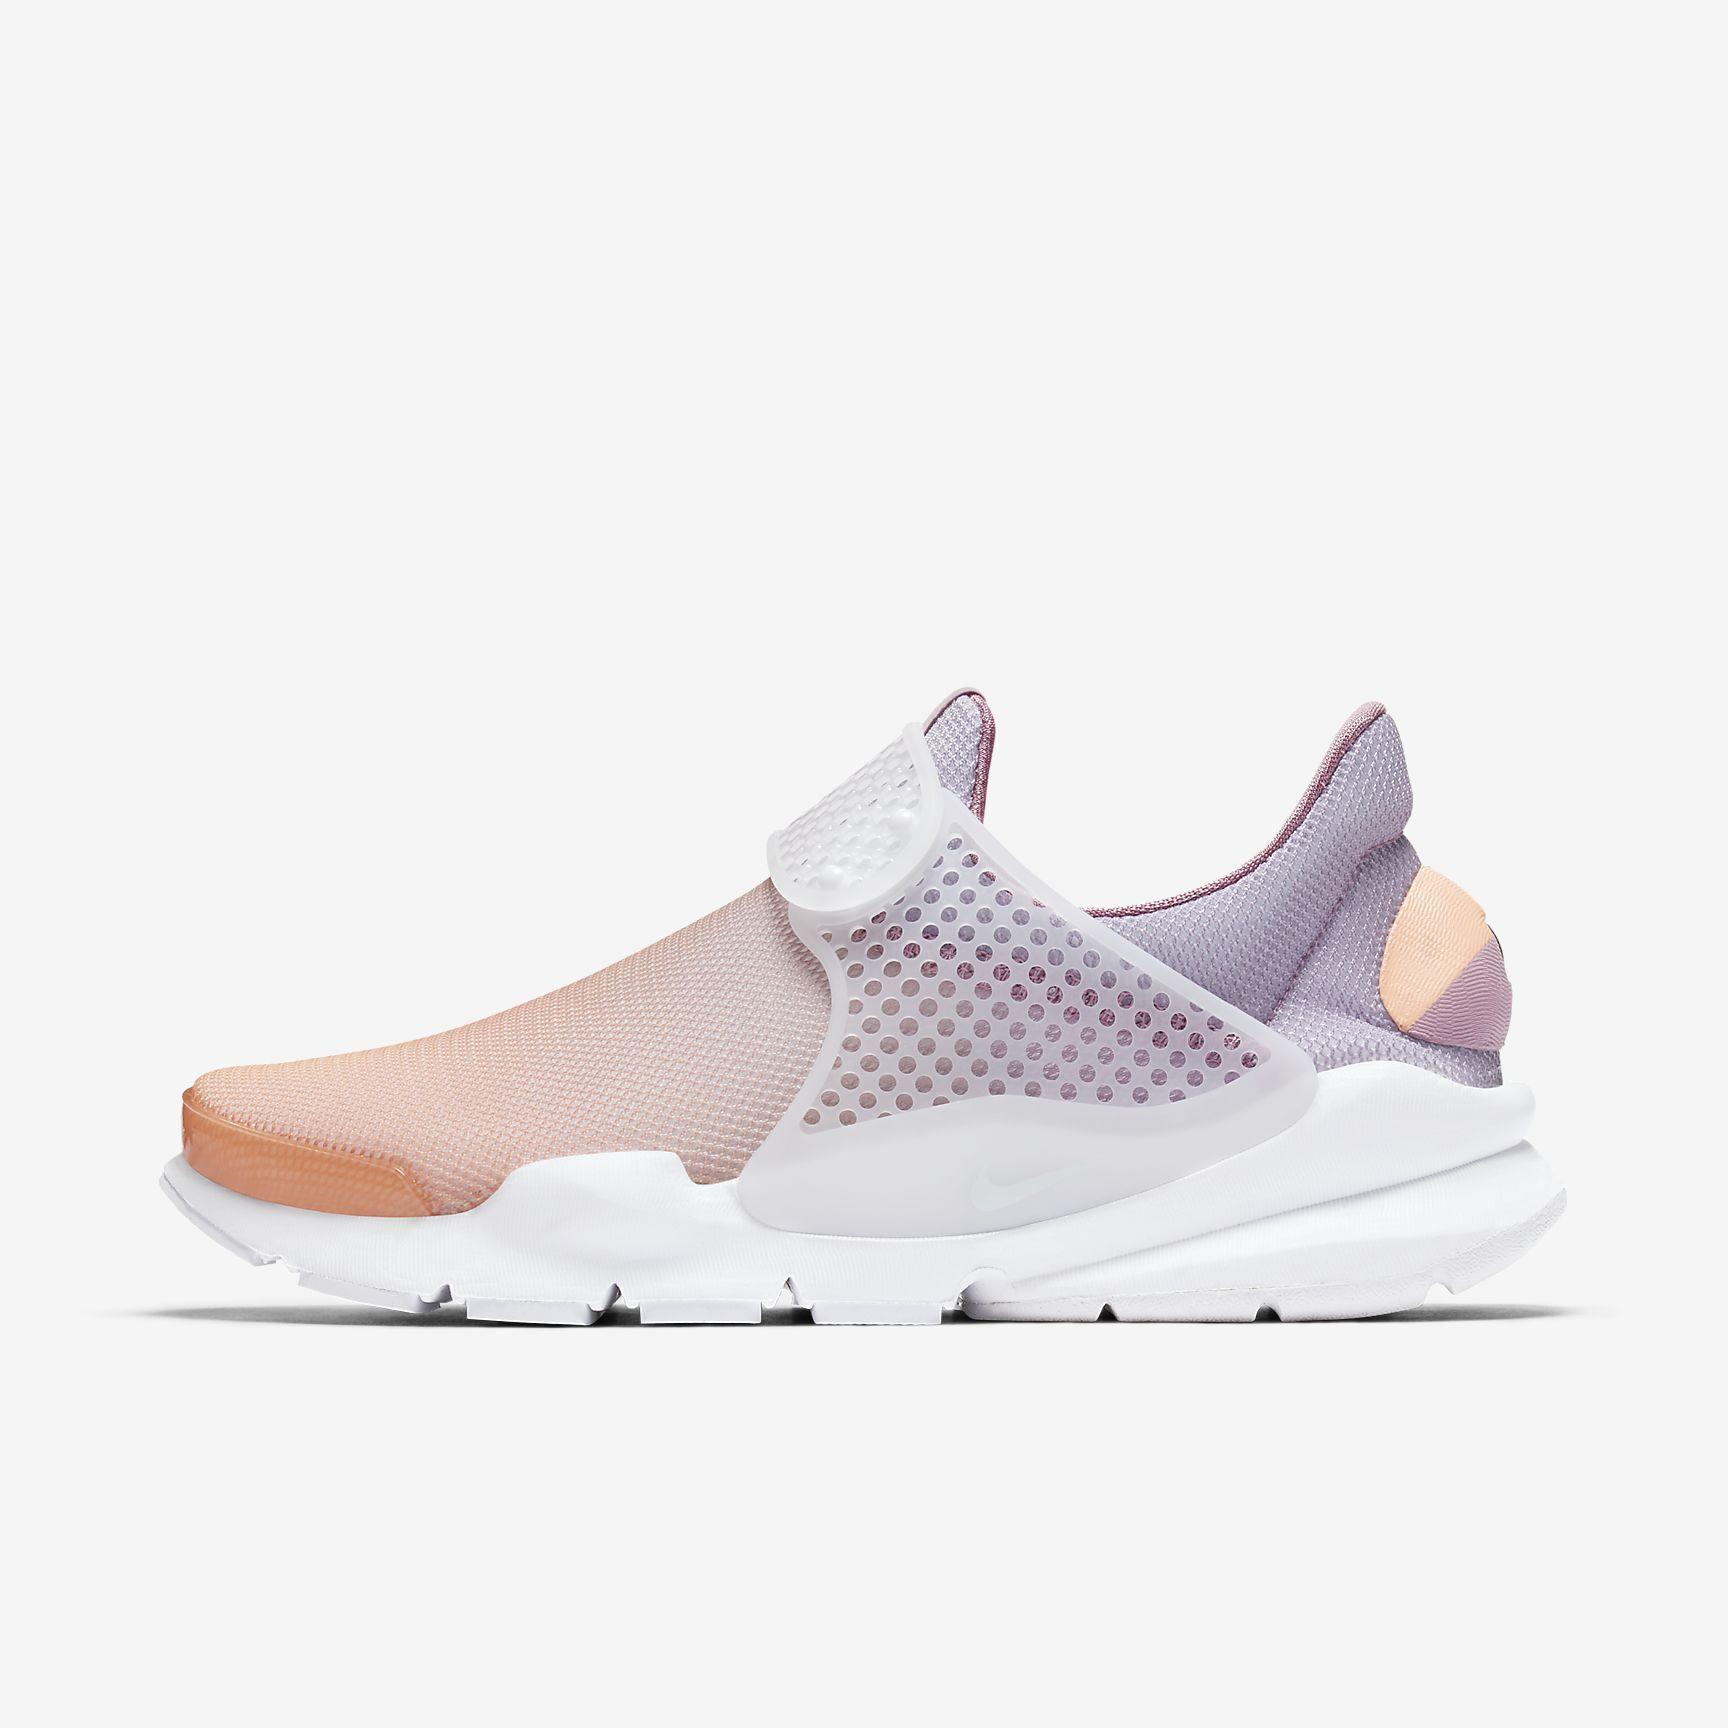 Chaussure Nike Sock Dart Breathe pour Femme